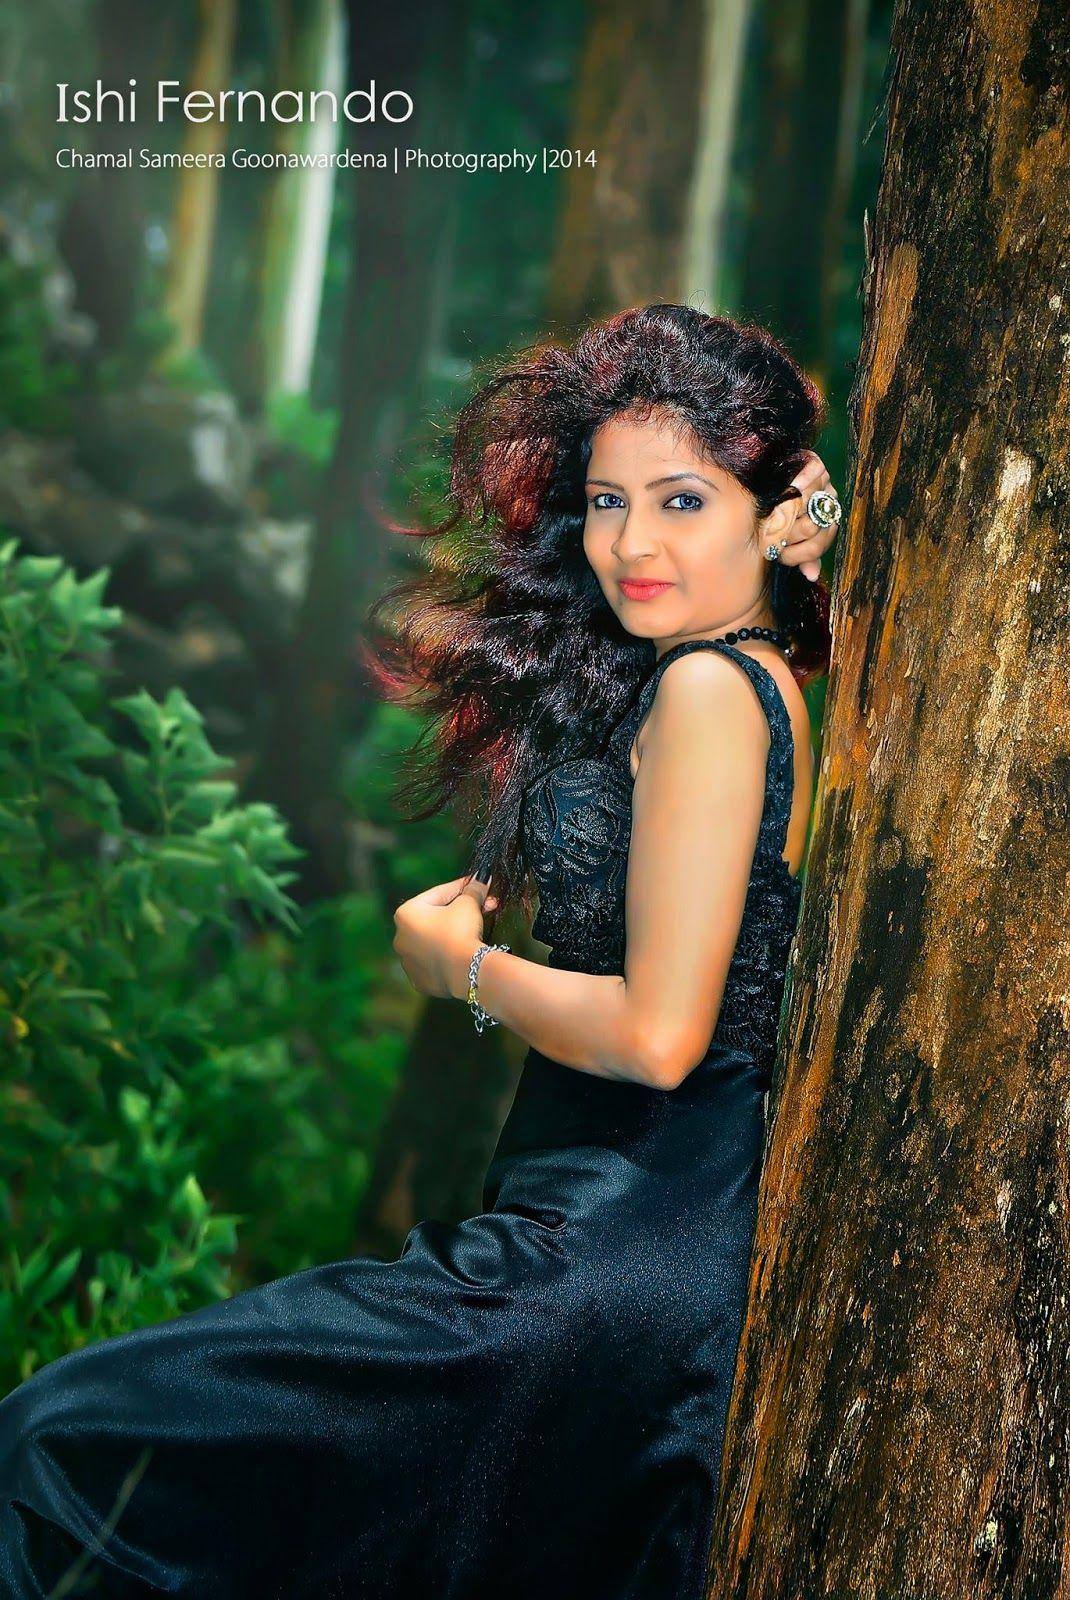 Sri lankan hot girls photos. Lankan Girls Hot Sexy Photos - ශ්රී ලංකාවේ හොට් ෆොටෝ සයිට් එක